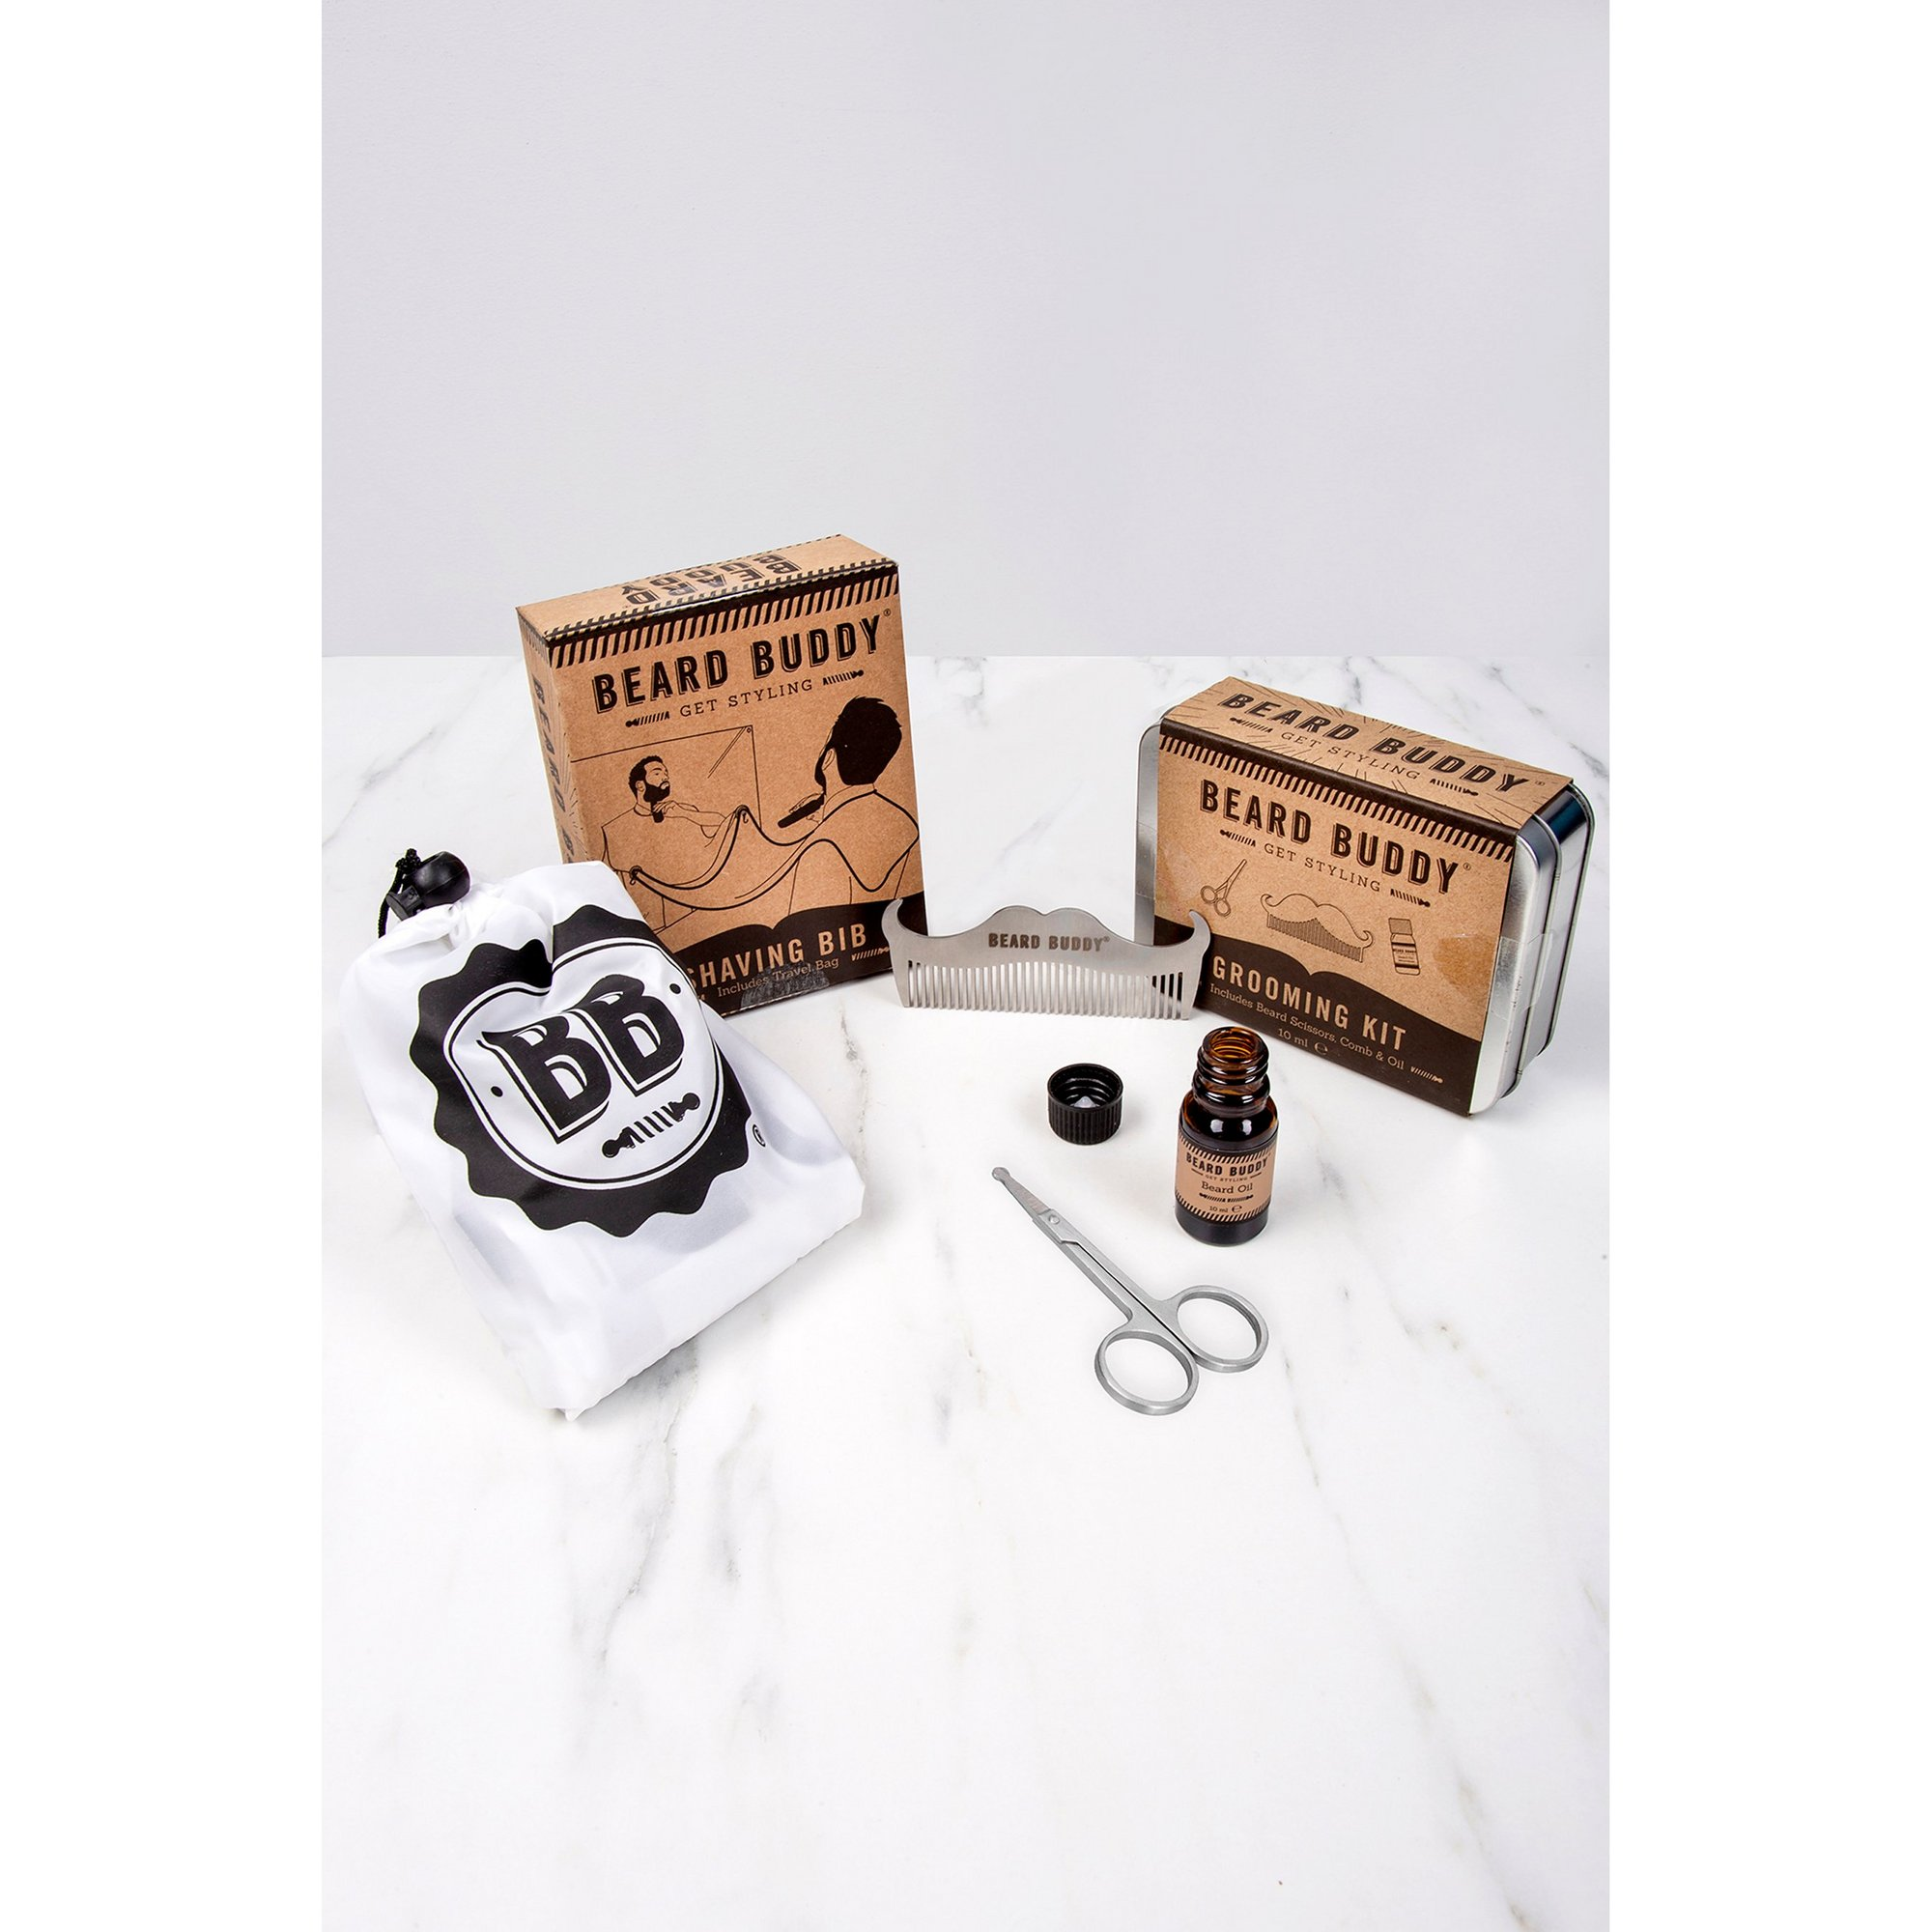 Image of Beard Buddy Shaving Bib and Grooming Kit